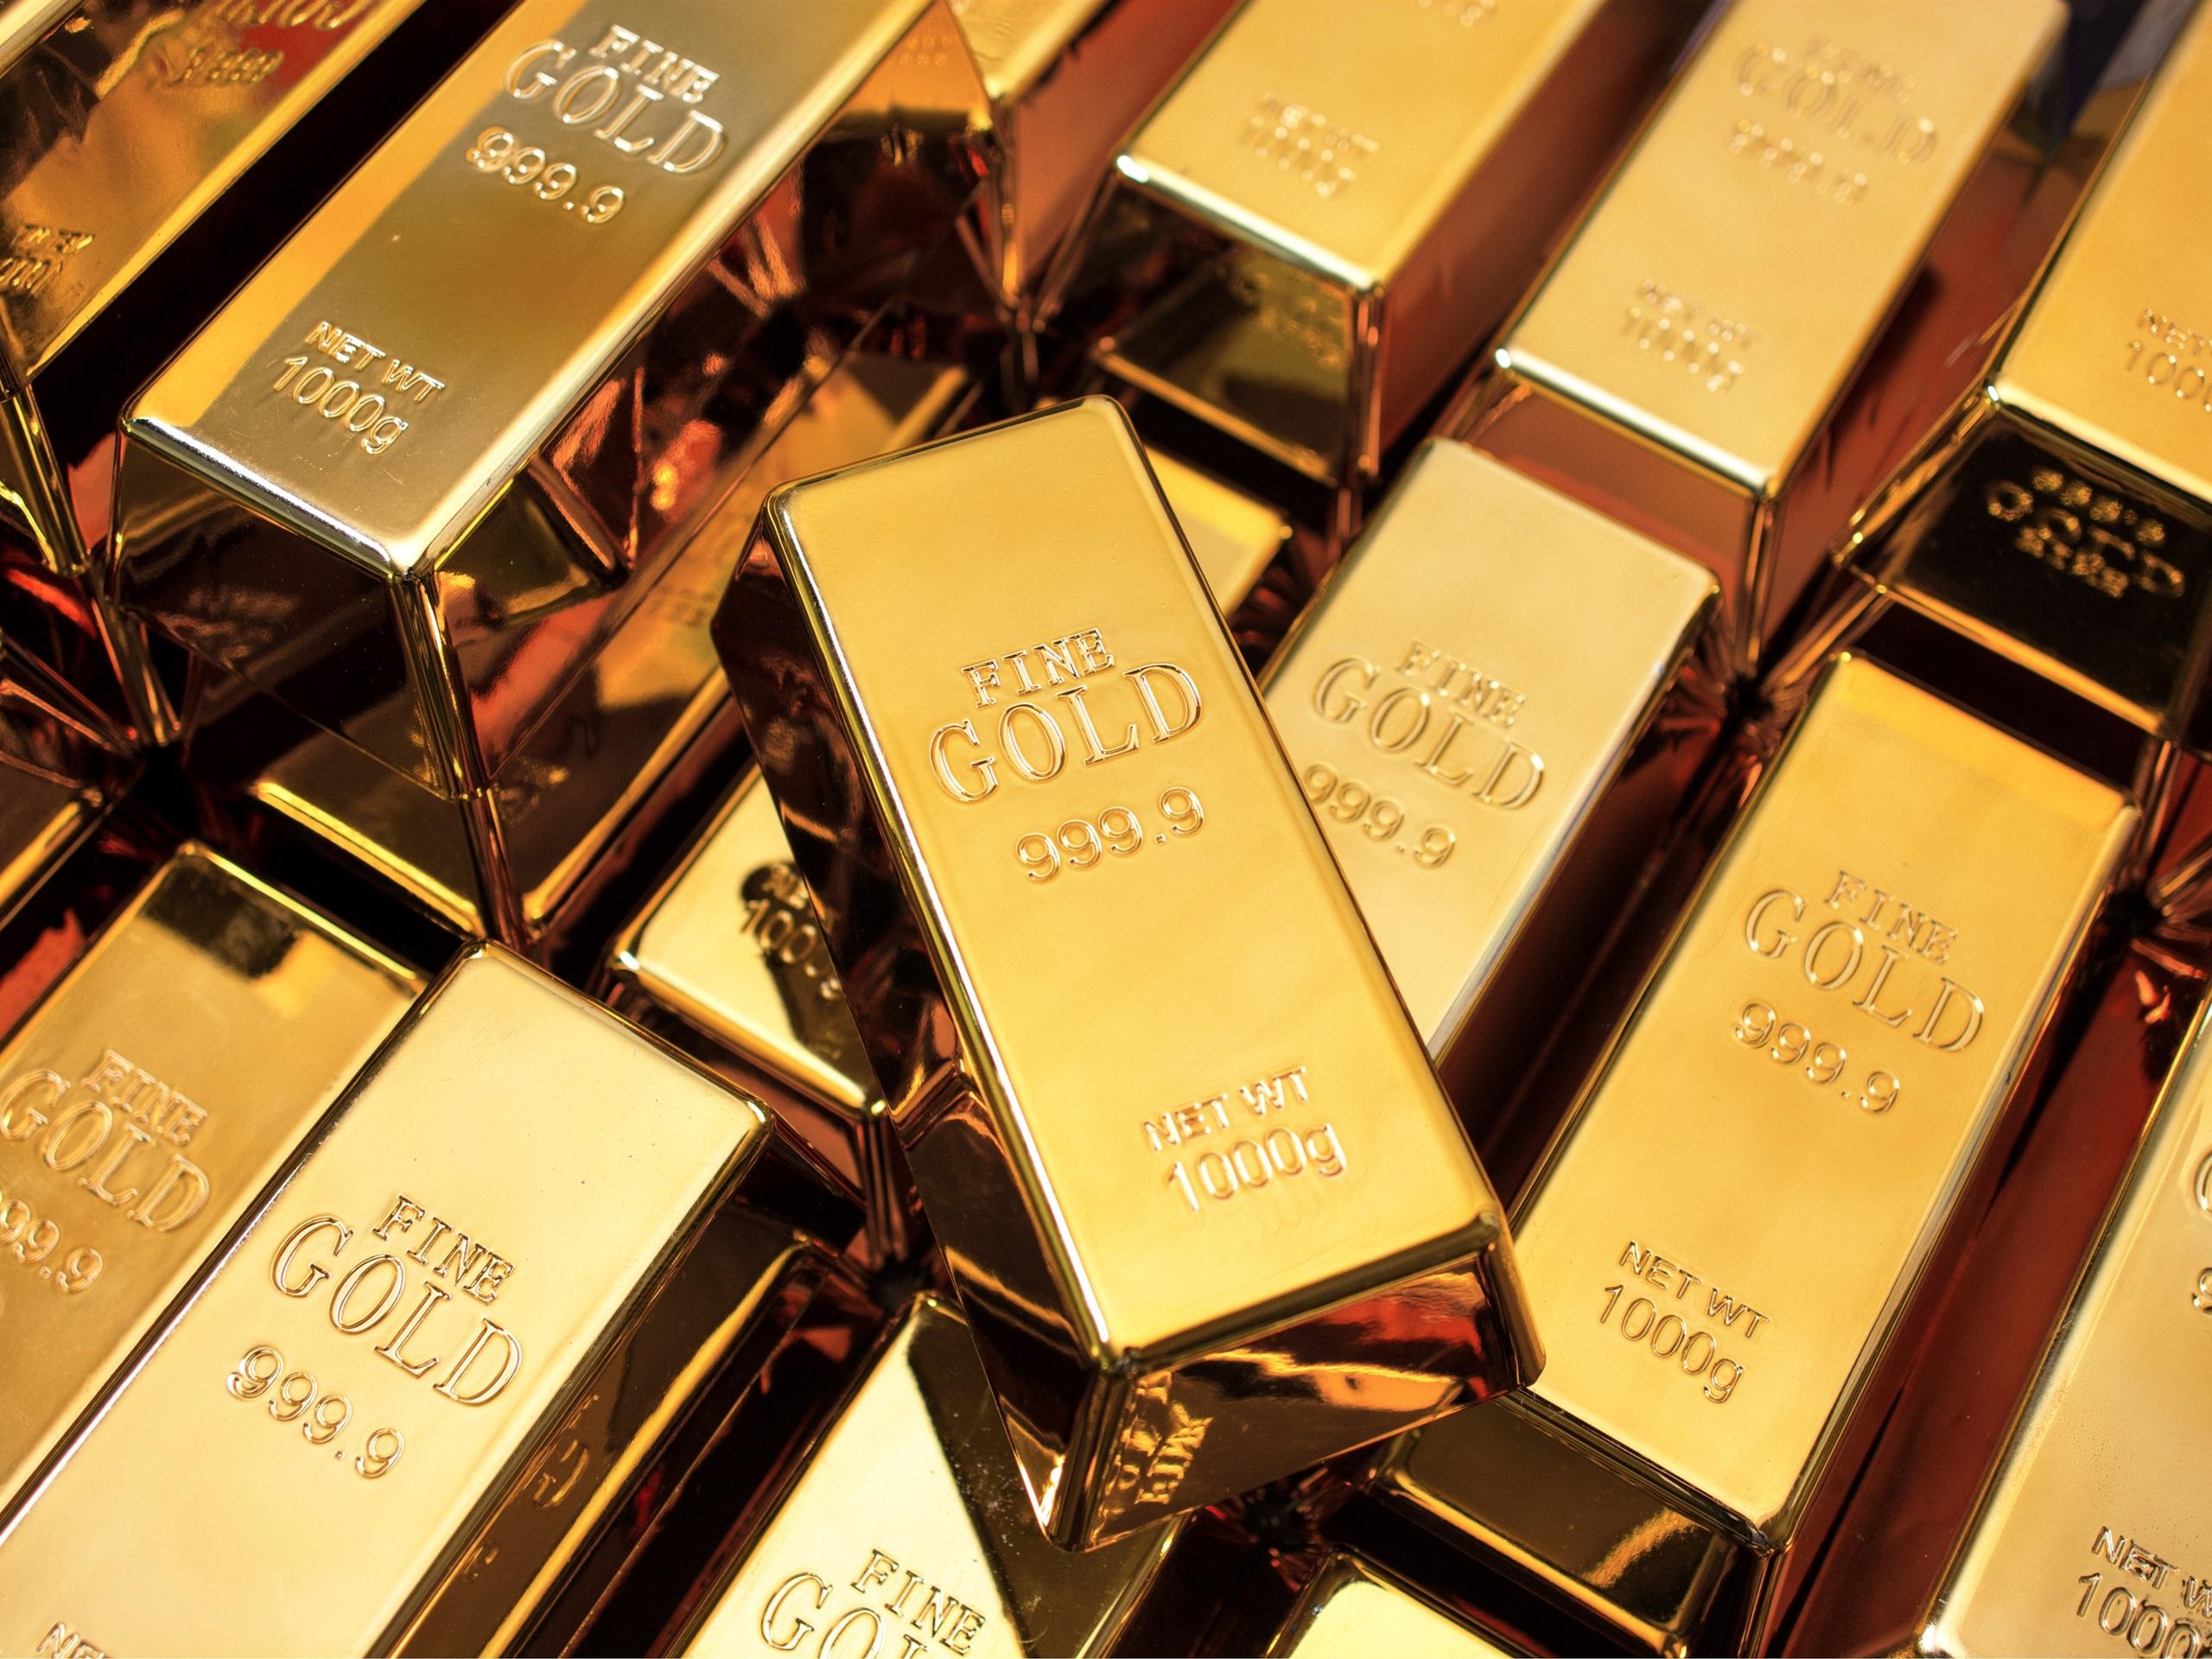 Wallpaper High Purity Gold Bullion 3840x2160 Uhd 4k